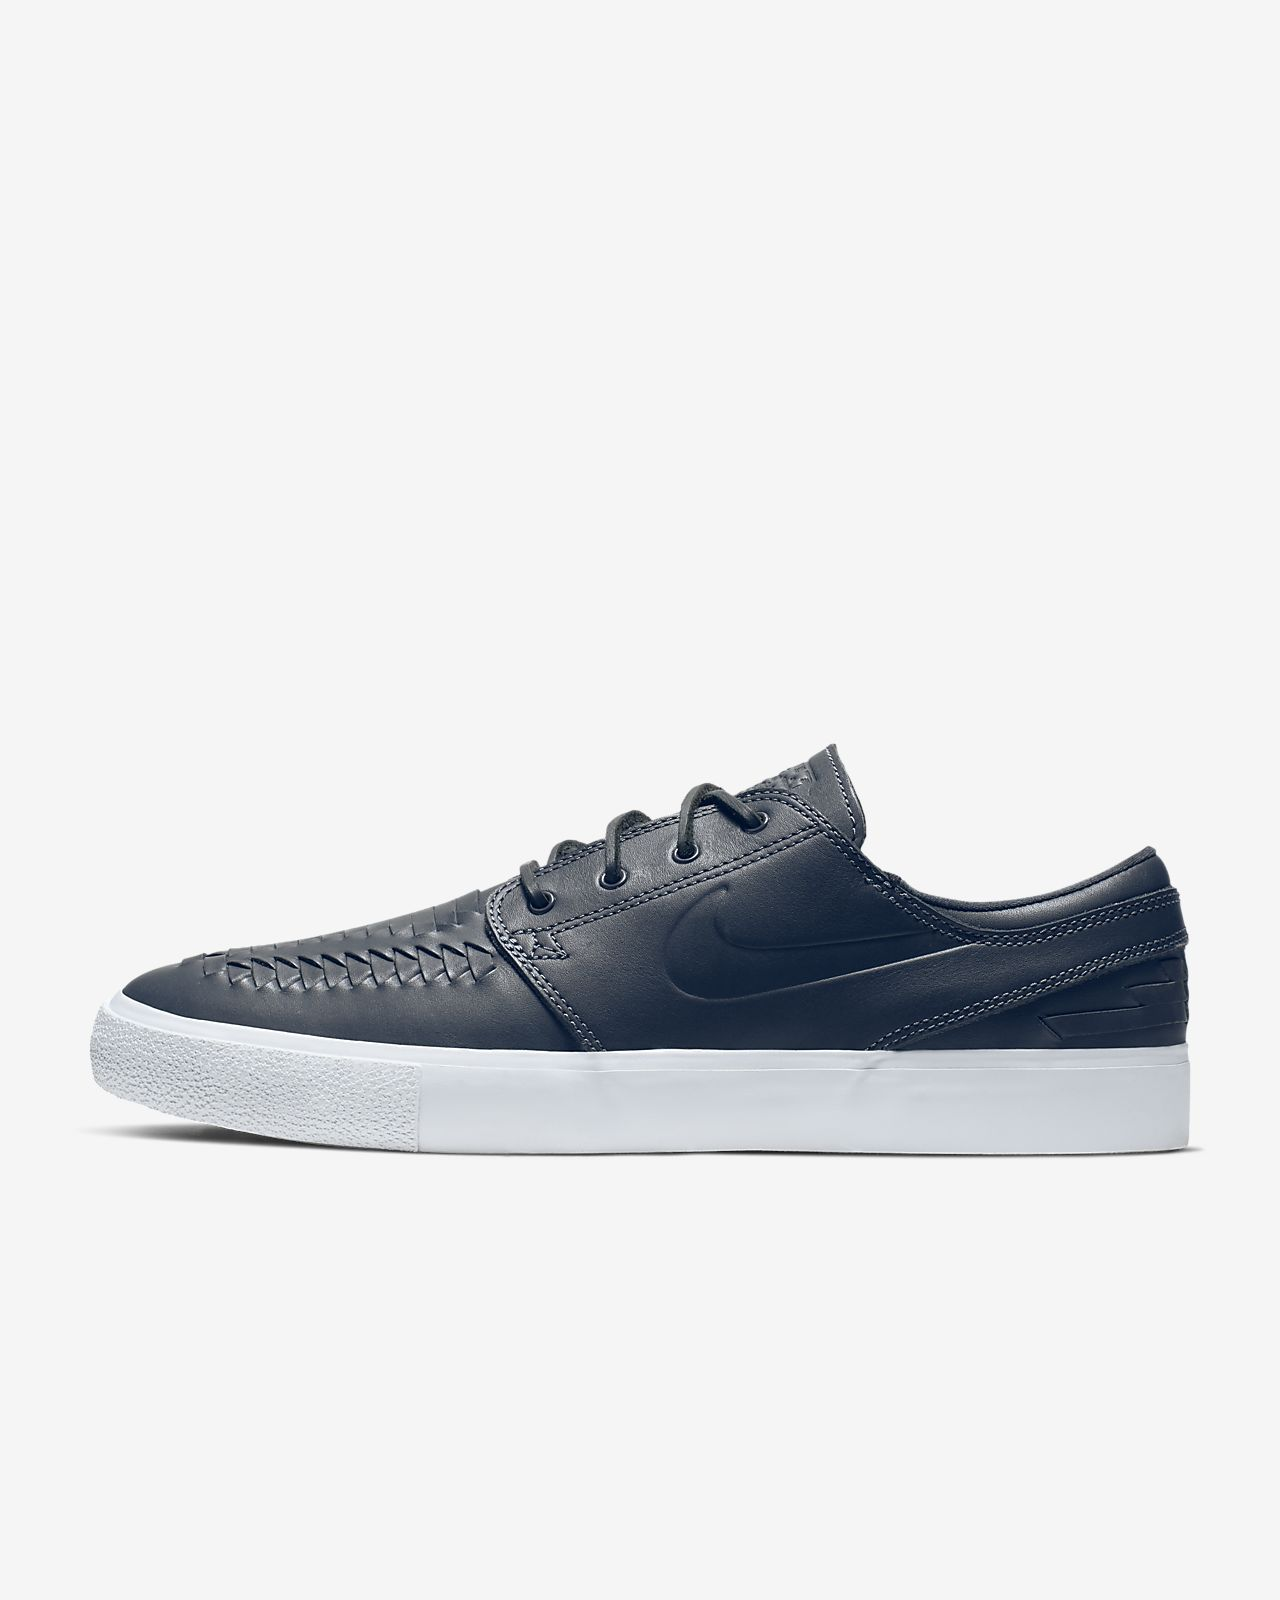 Sapatilhas de skateboard Nike SB Zoom Stefan Janoski RM Crafted